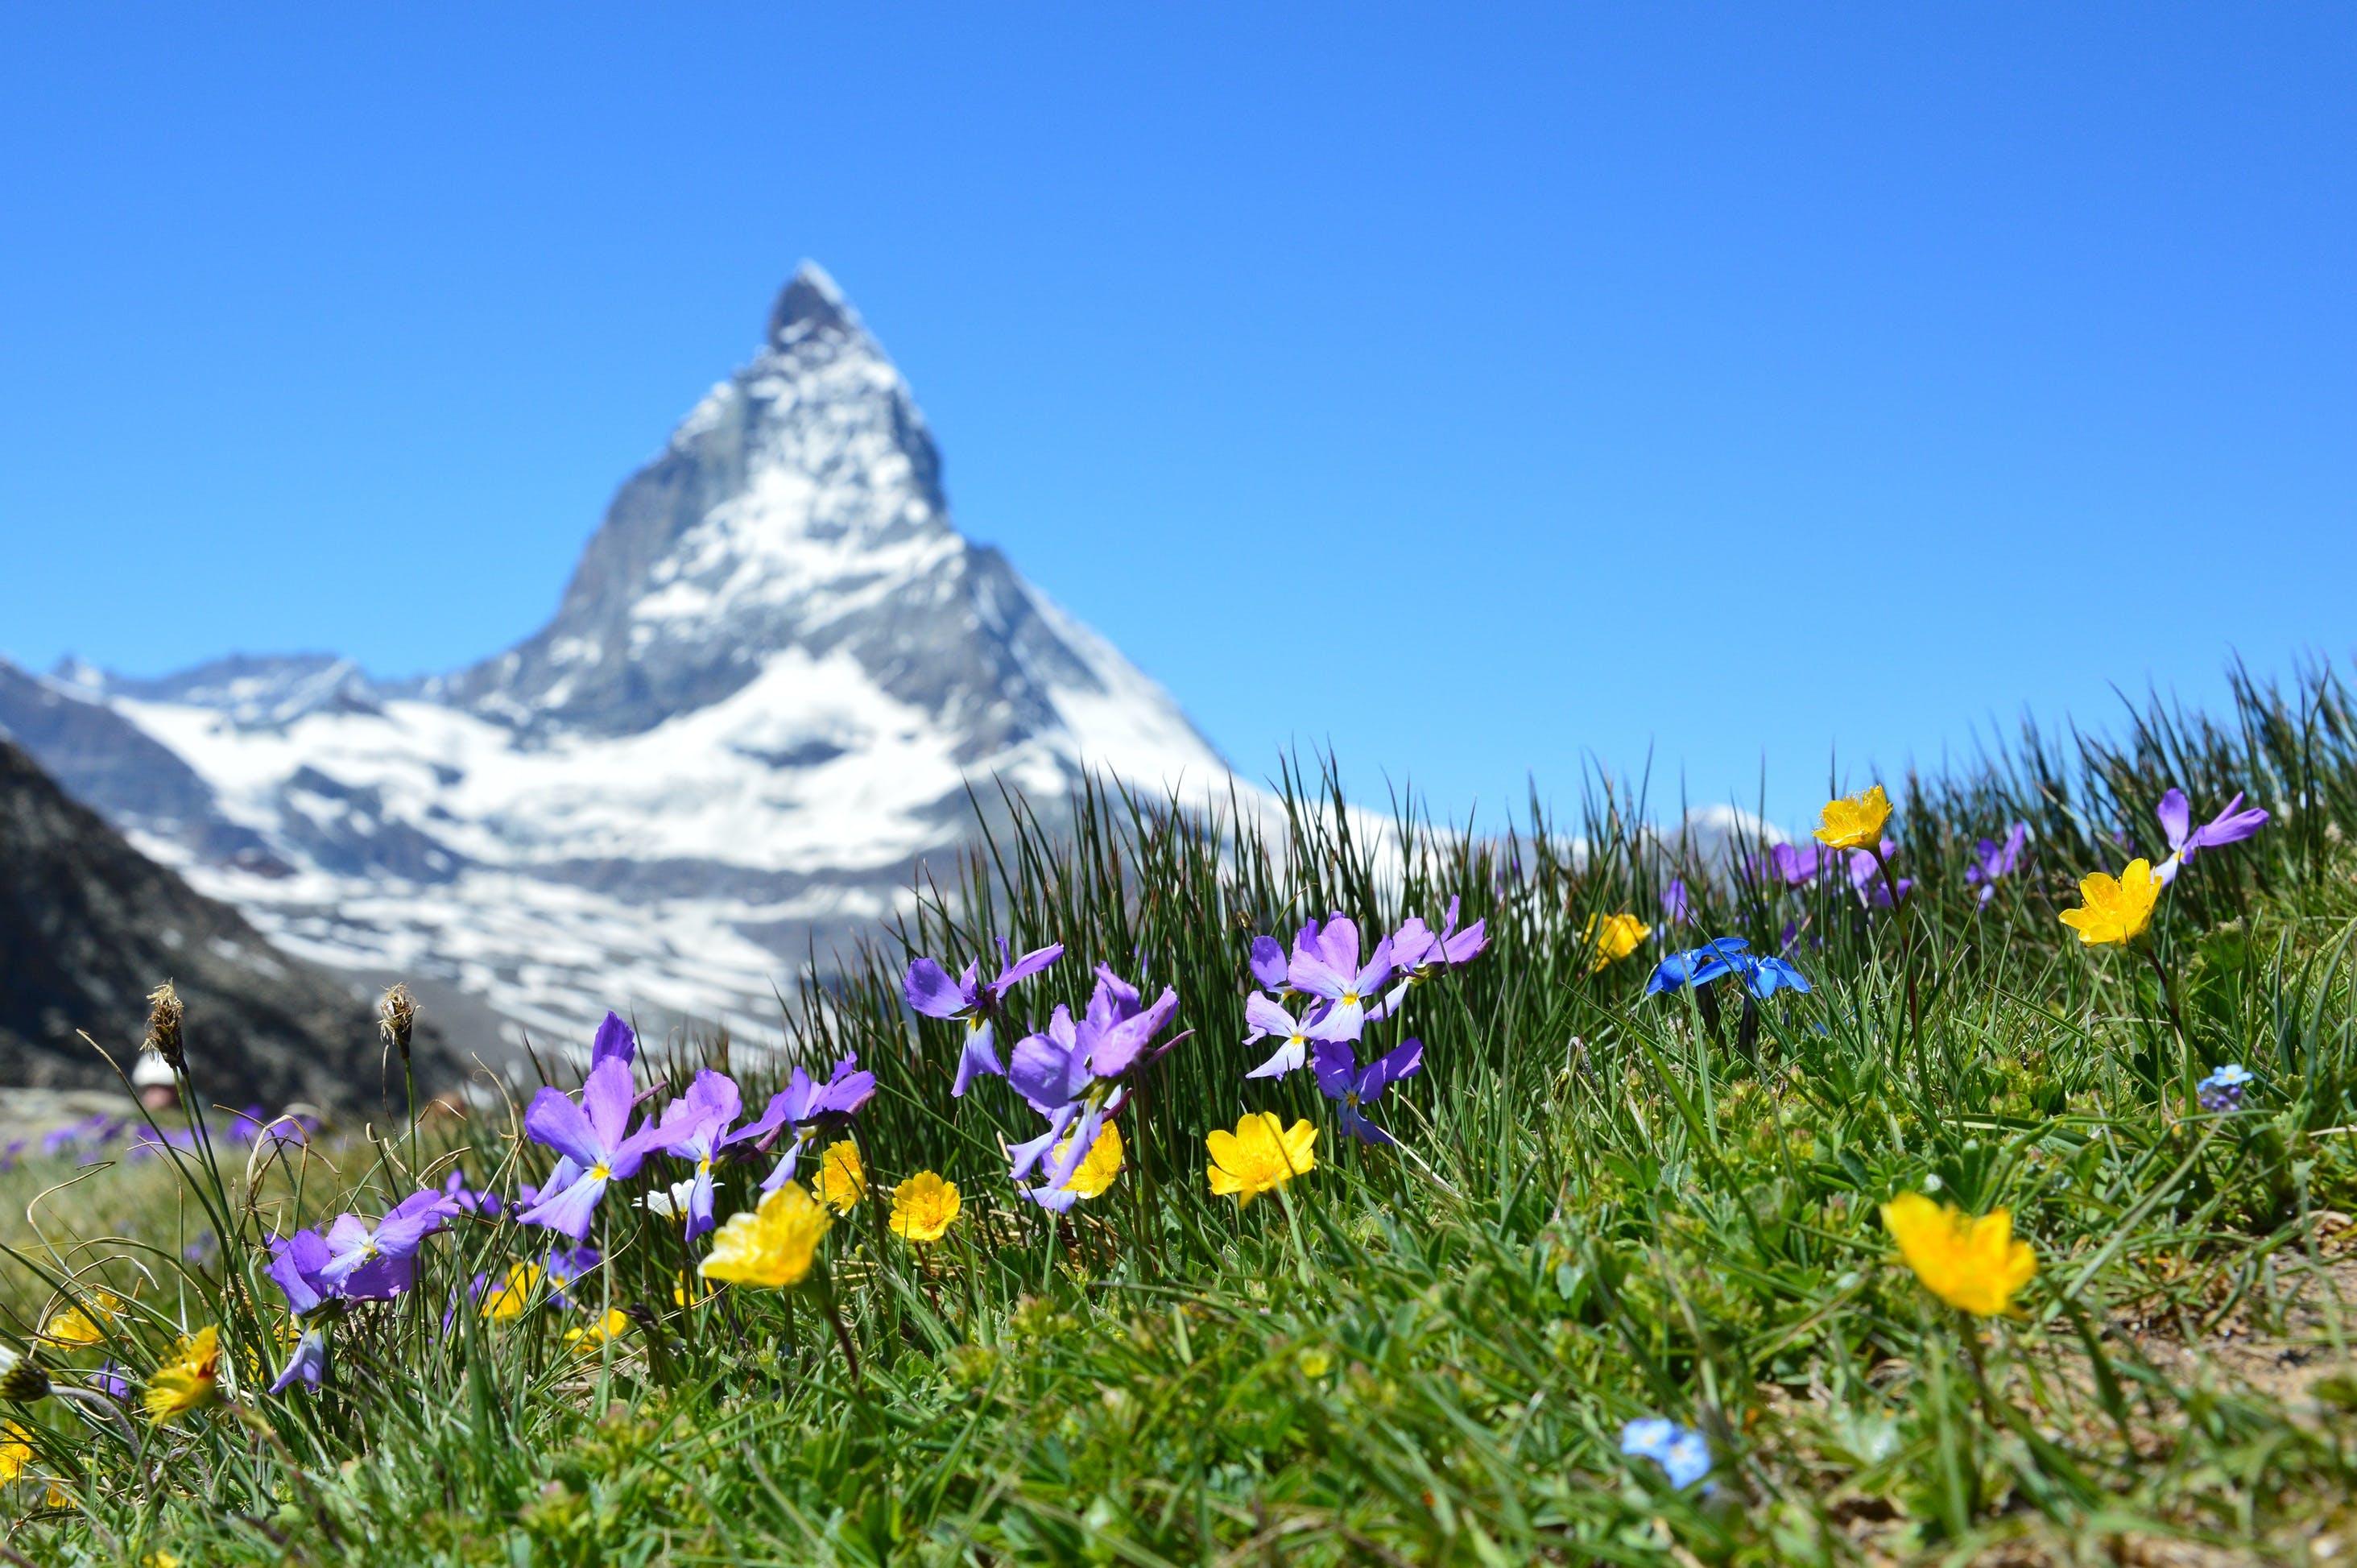 Petaled Flower on Grass Near Mountain ]